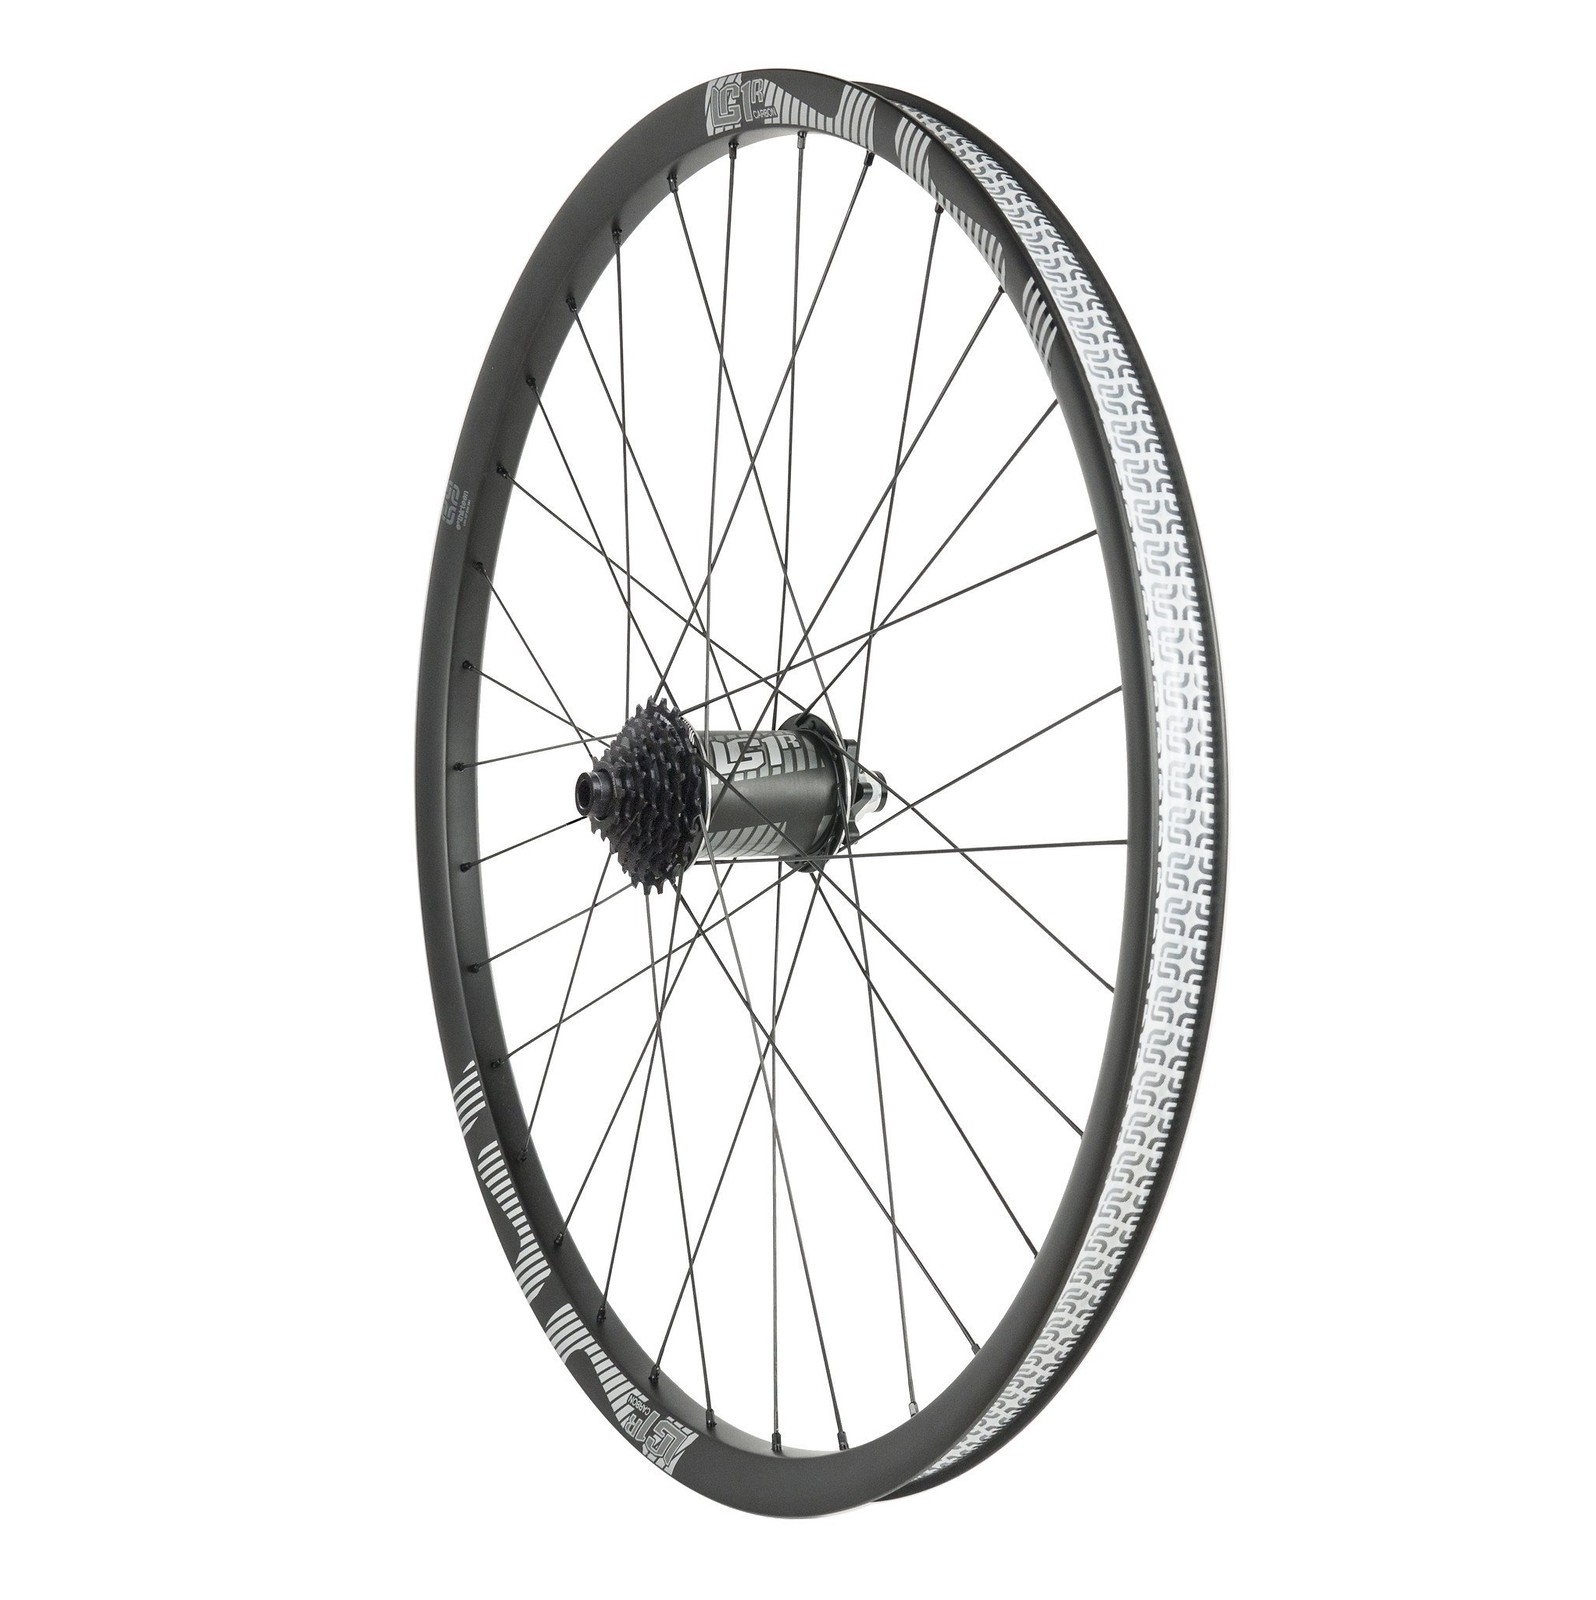 e*thirteen LG1 Race Wheelset LG1r_7speed_2048x2048